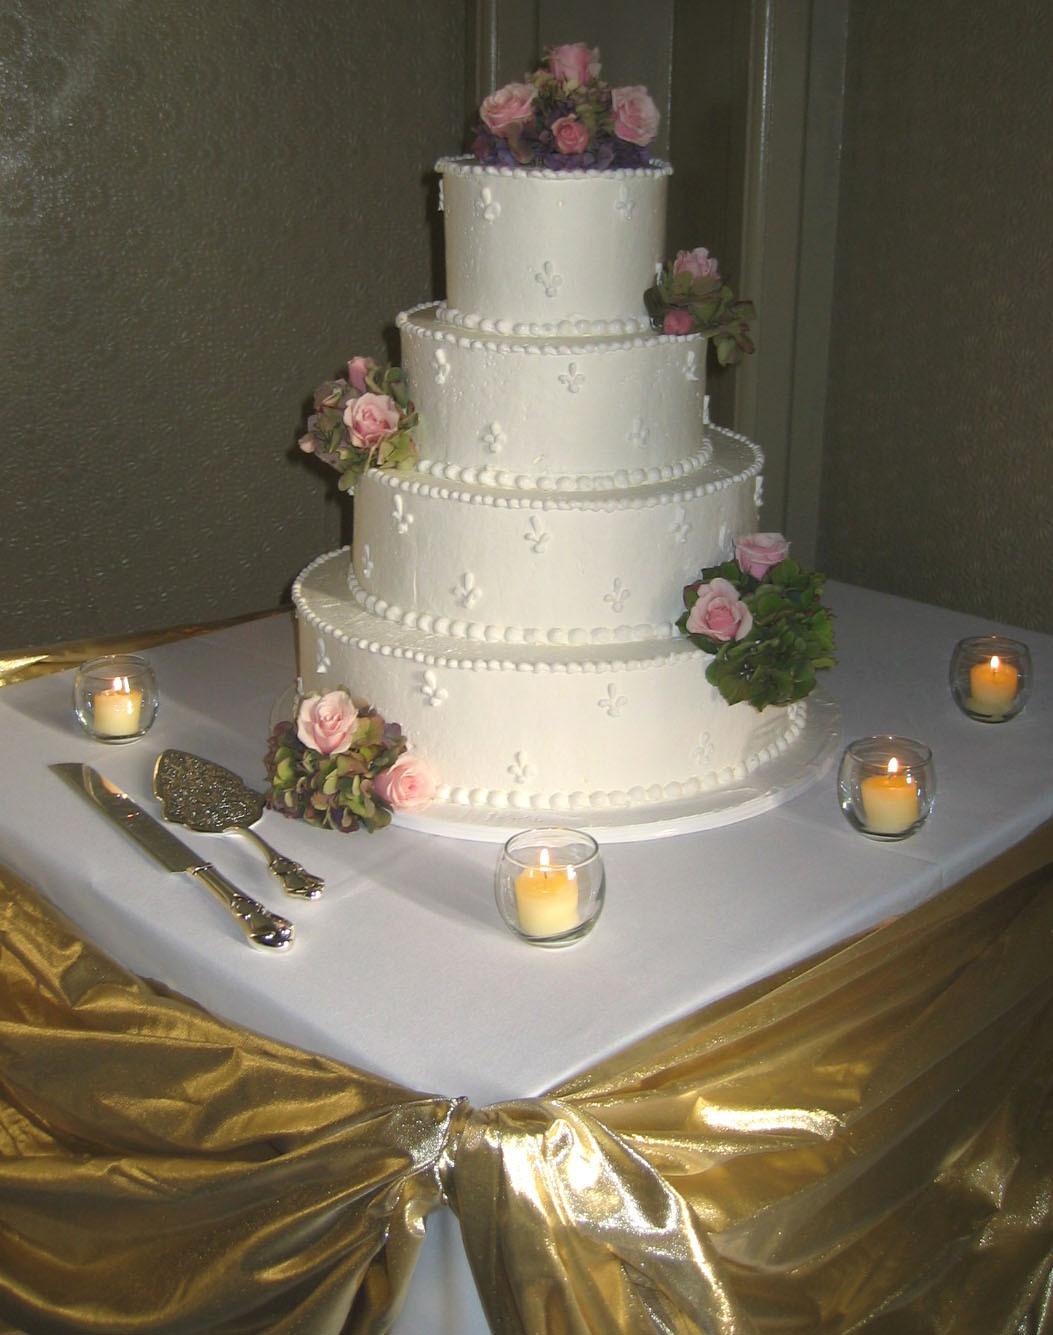 Cakes, pink, cake, Roses, Wedding cake, 4 tier cake